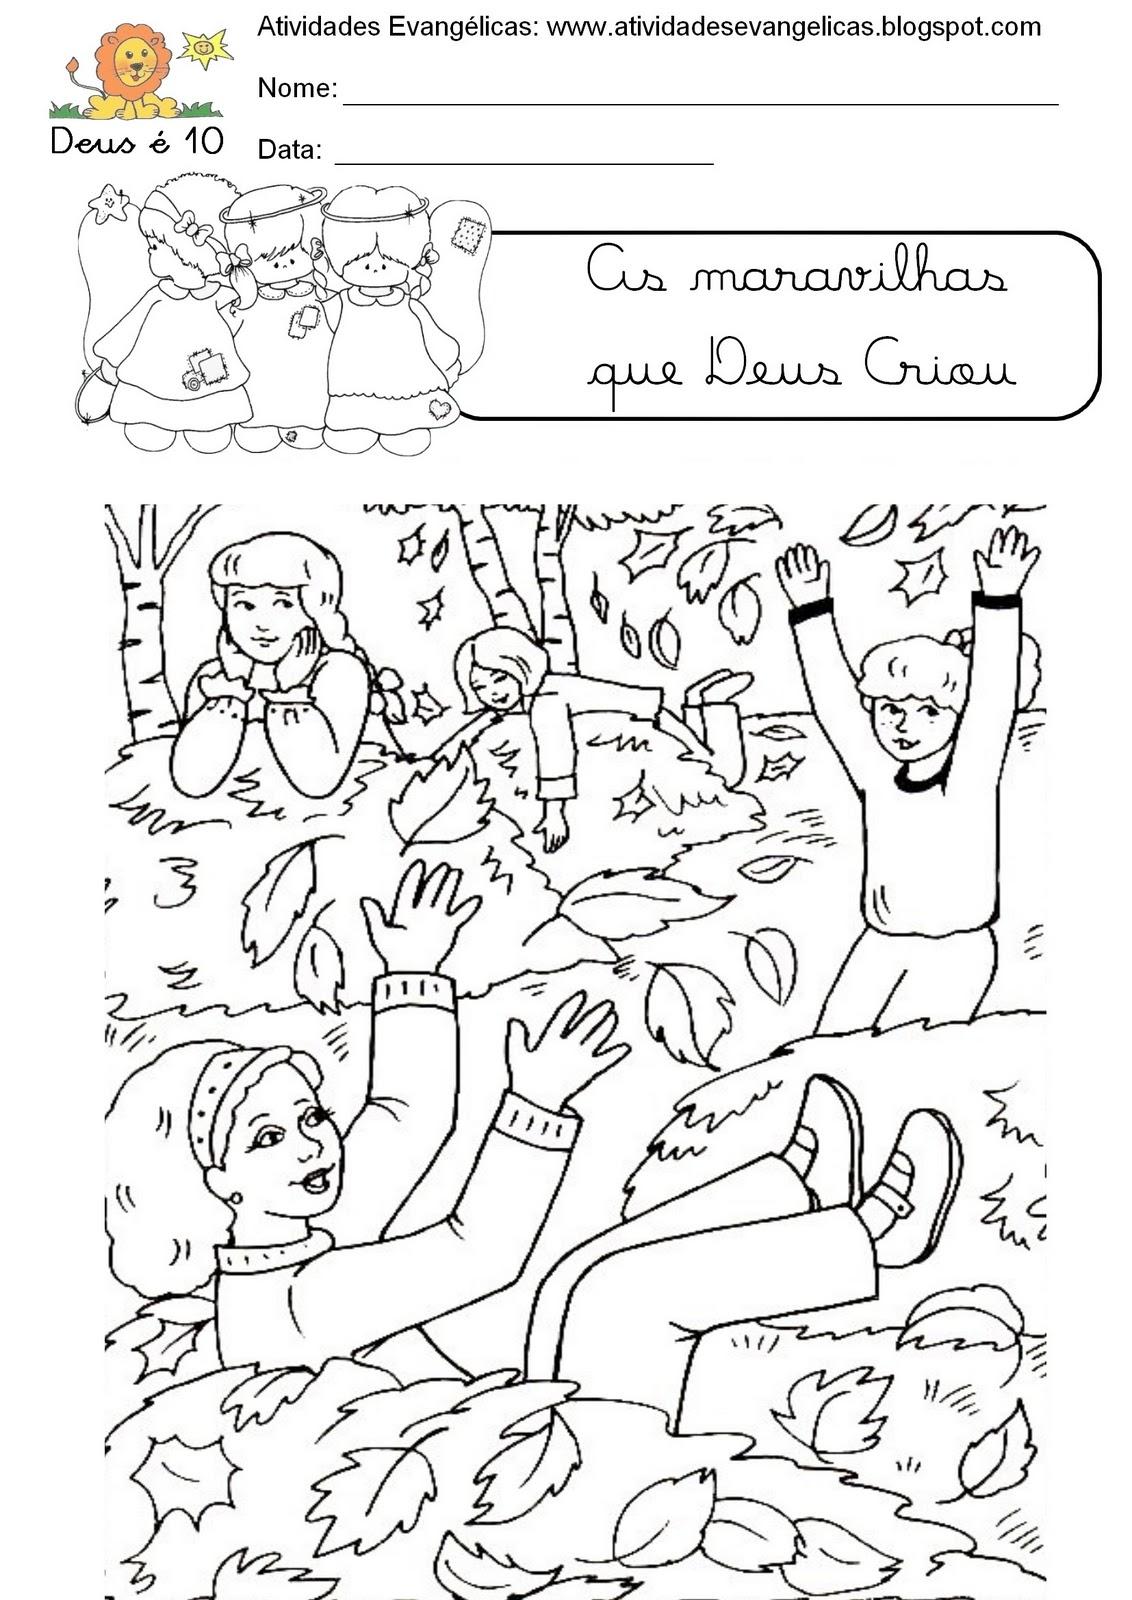 Postado Por Andreza Santos Florencio De Melo   S 15 36